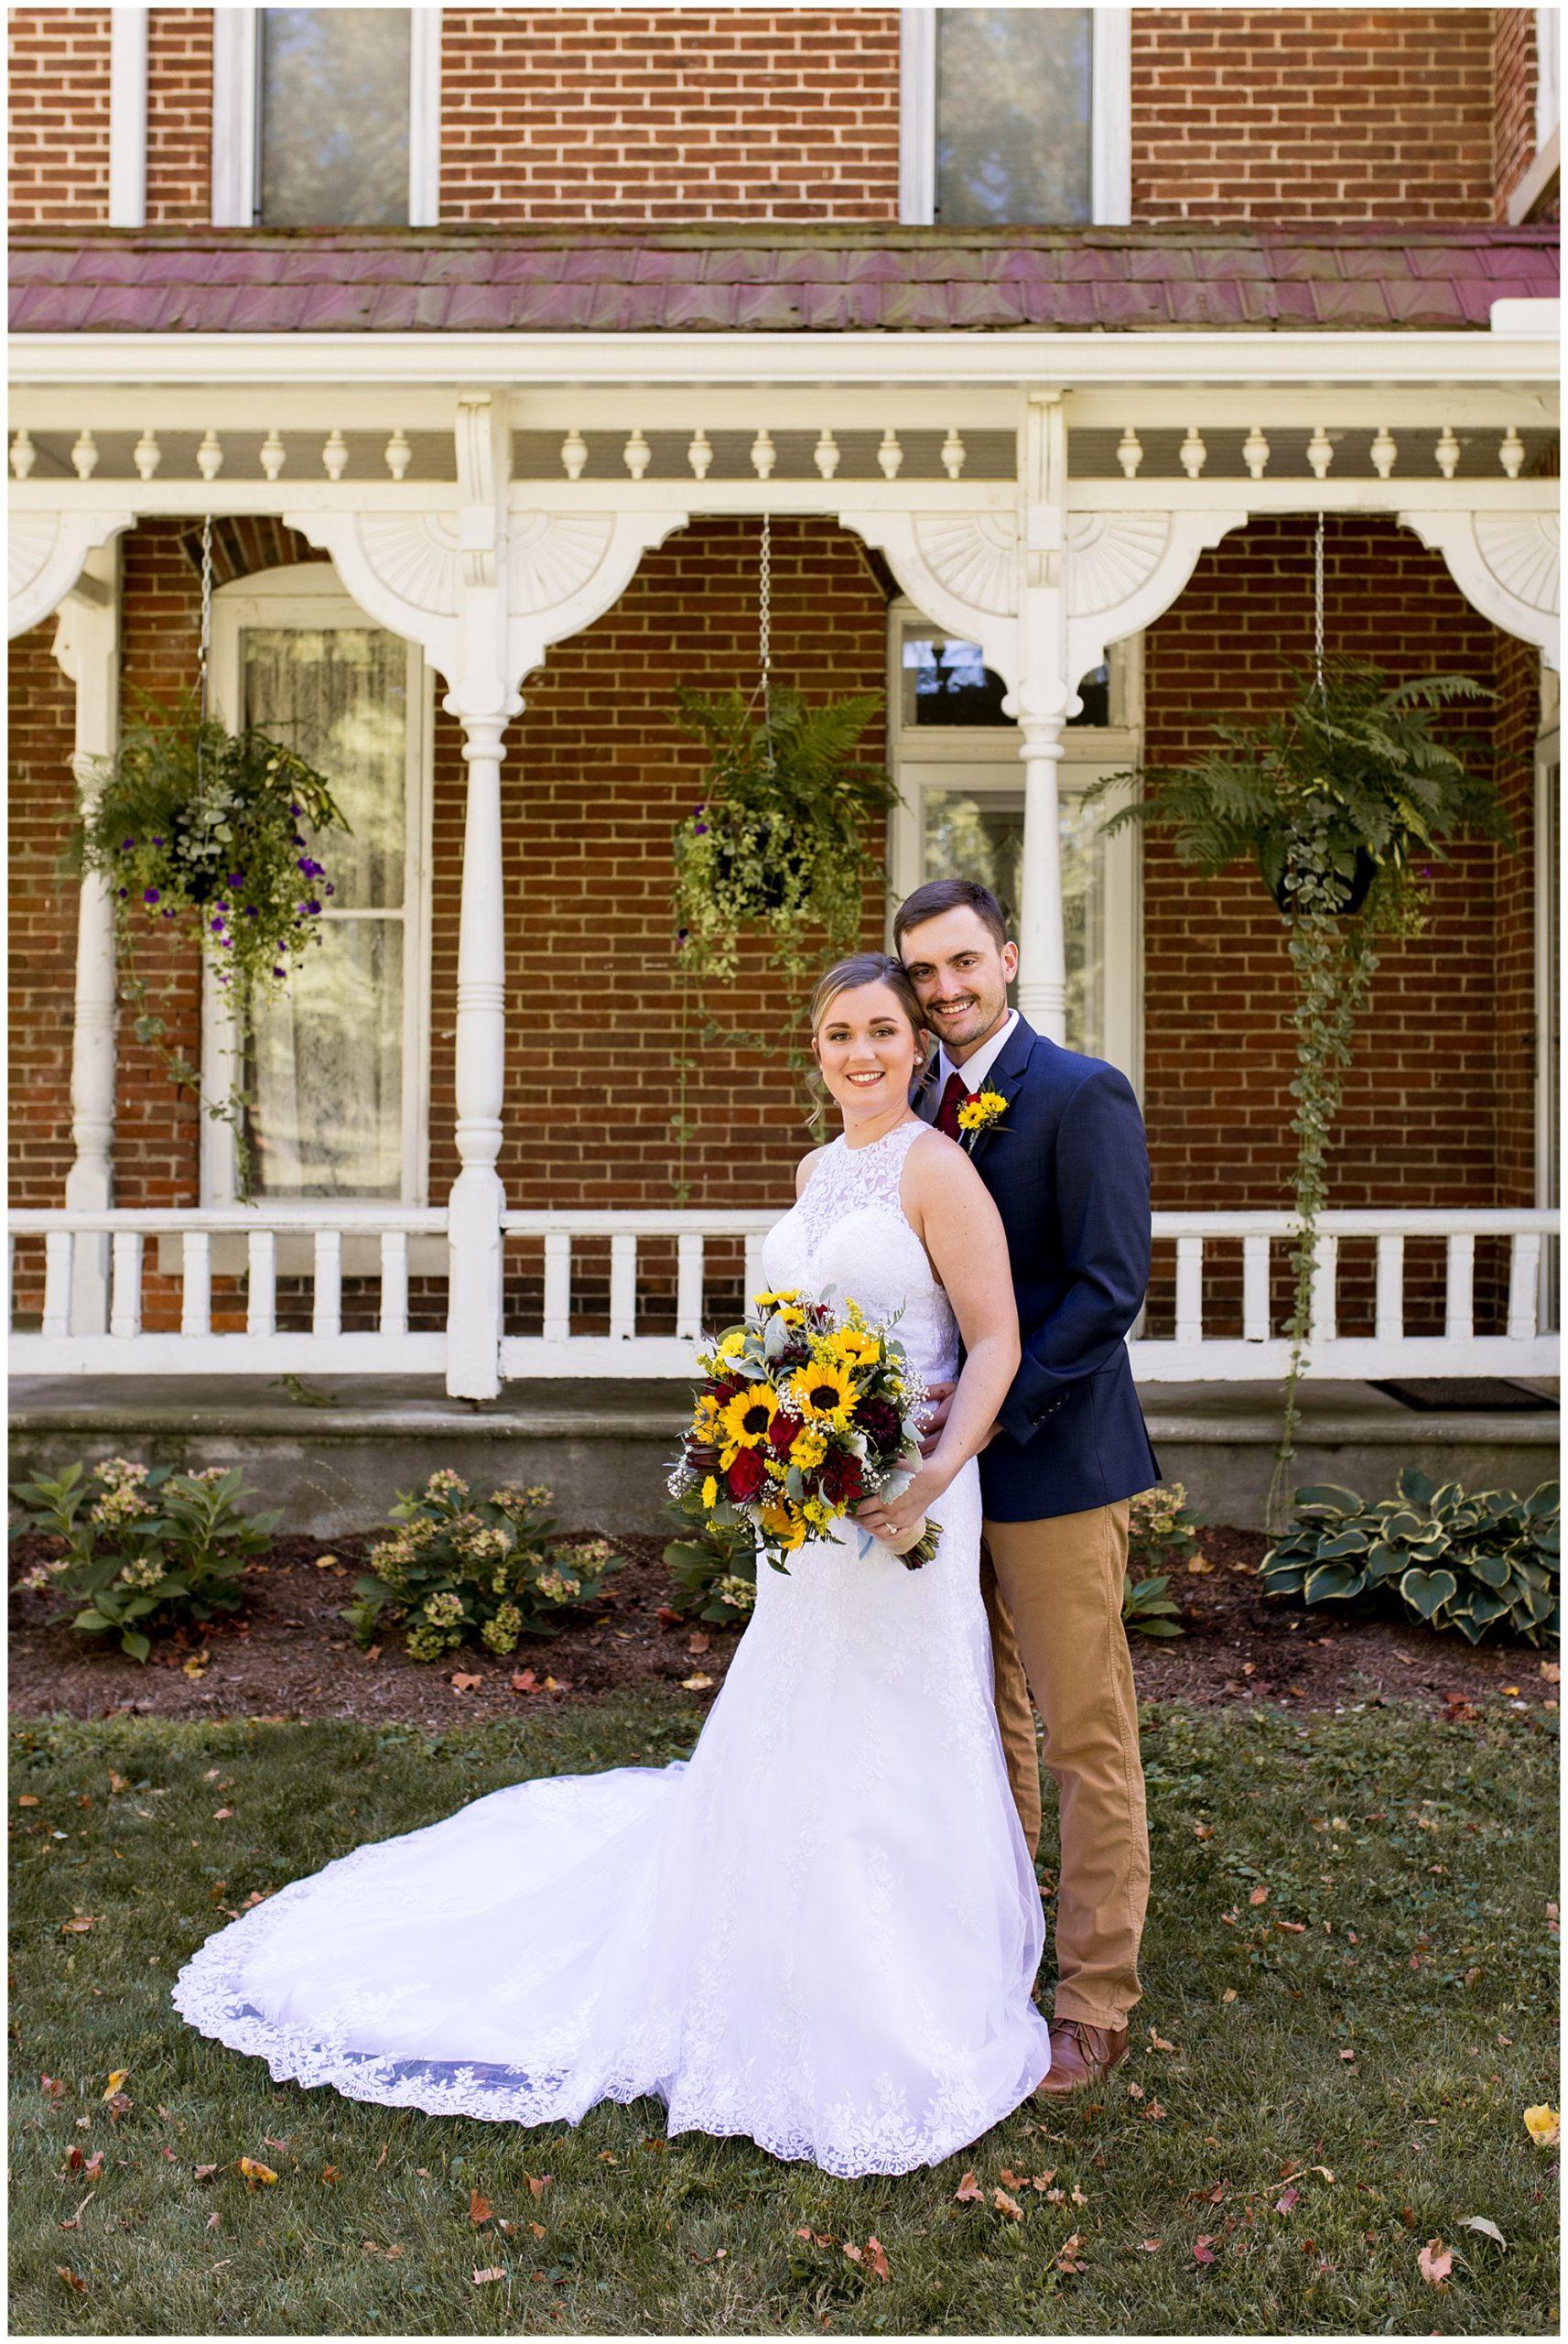 bride and groom wedding photos at Legacy Barn in Kokomo Indiana